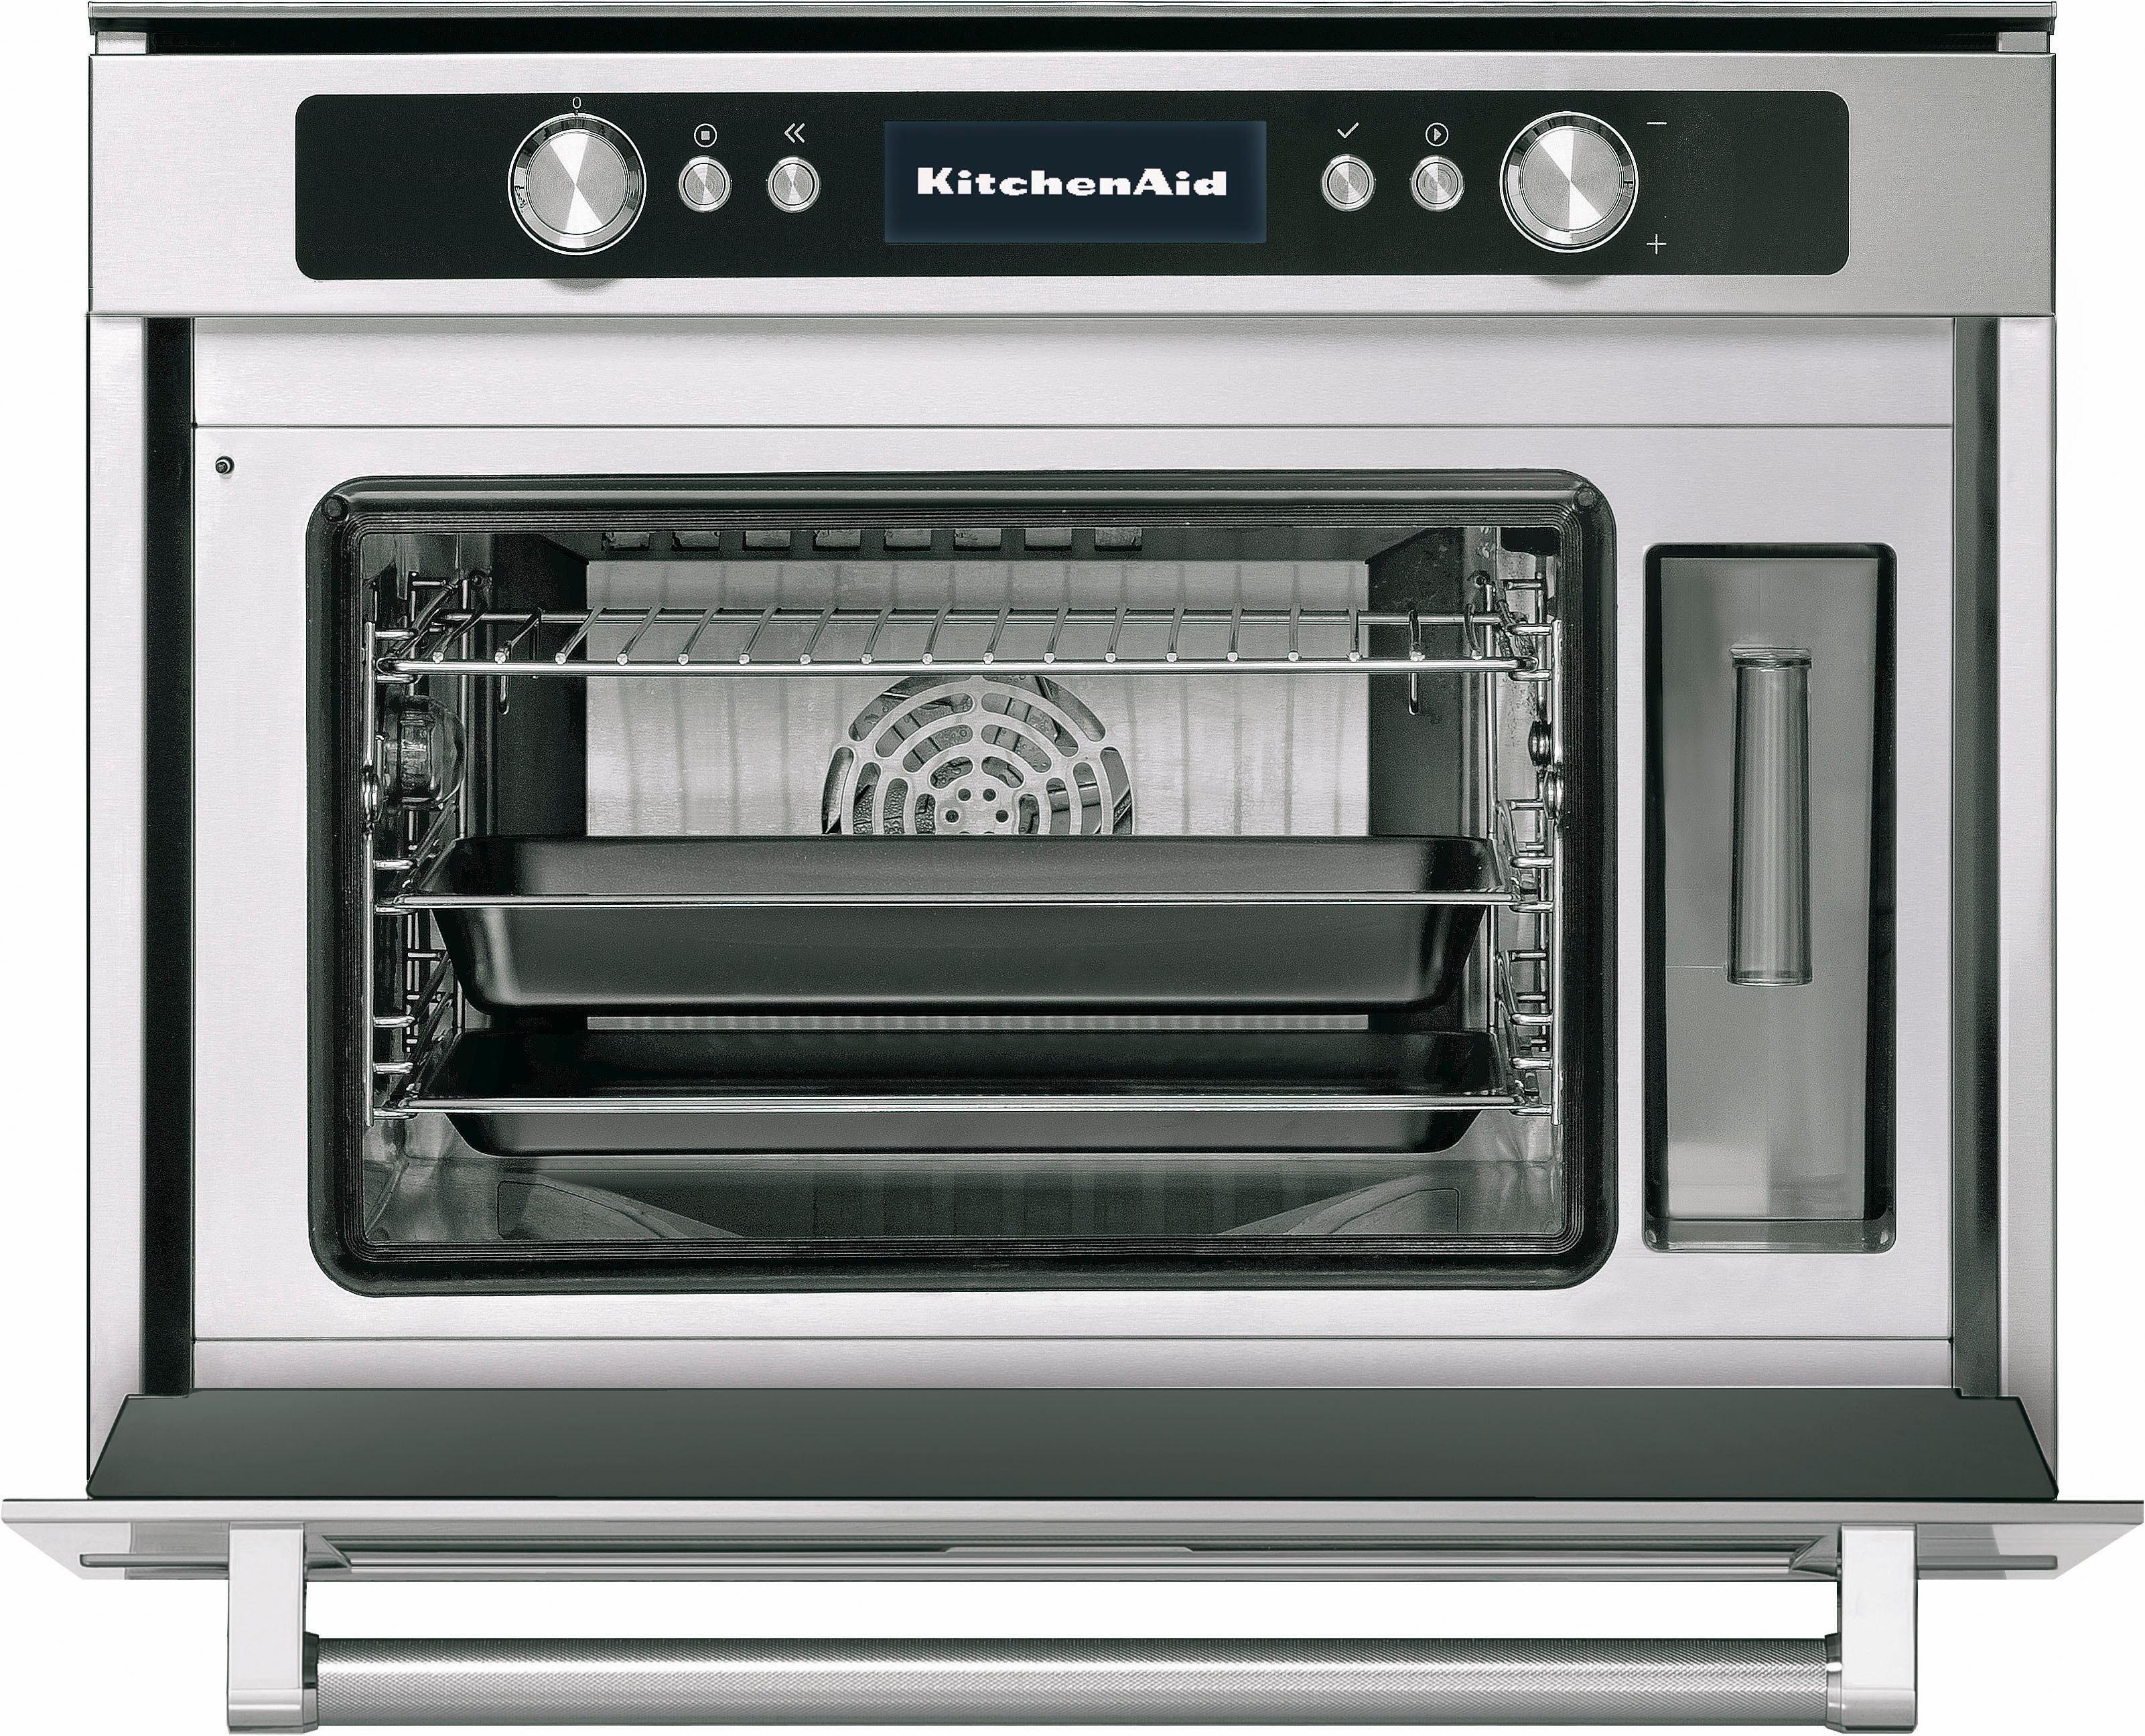 KitchenAid Einbau-Dampfgarer KOQCX 45600